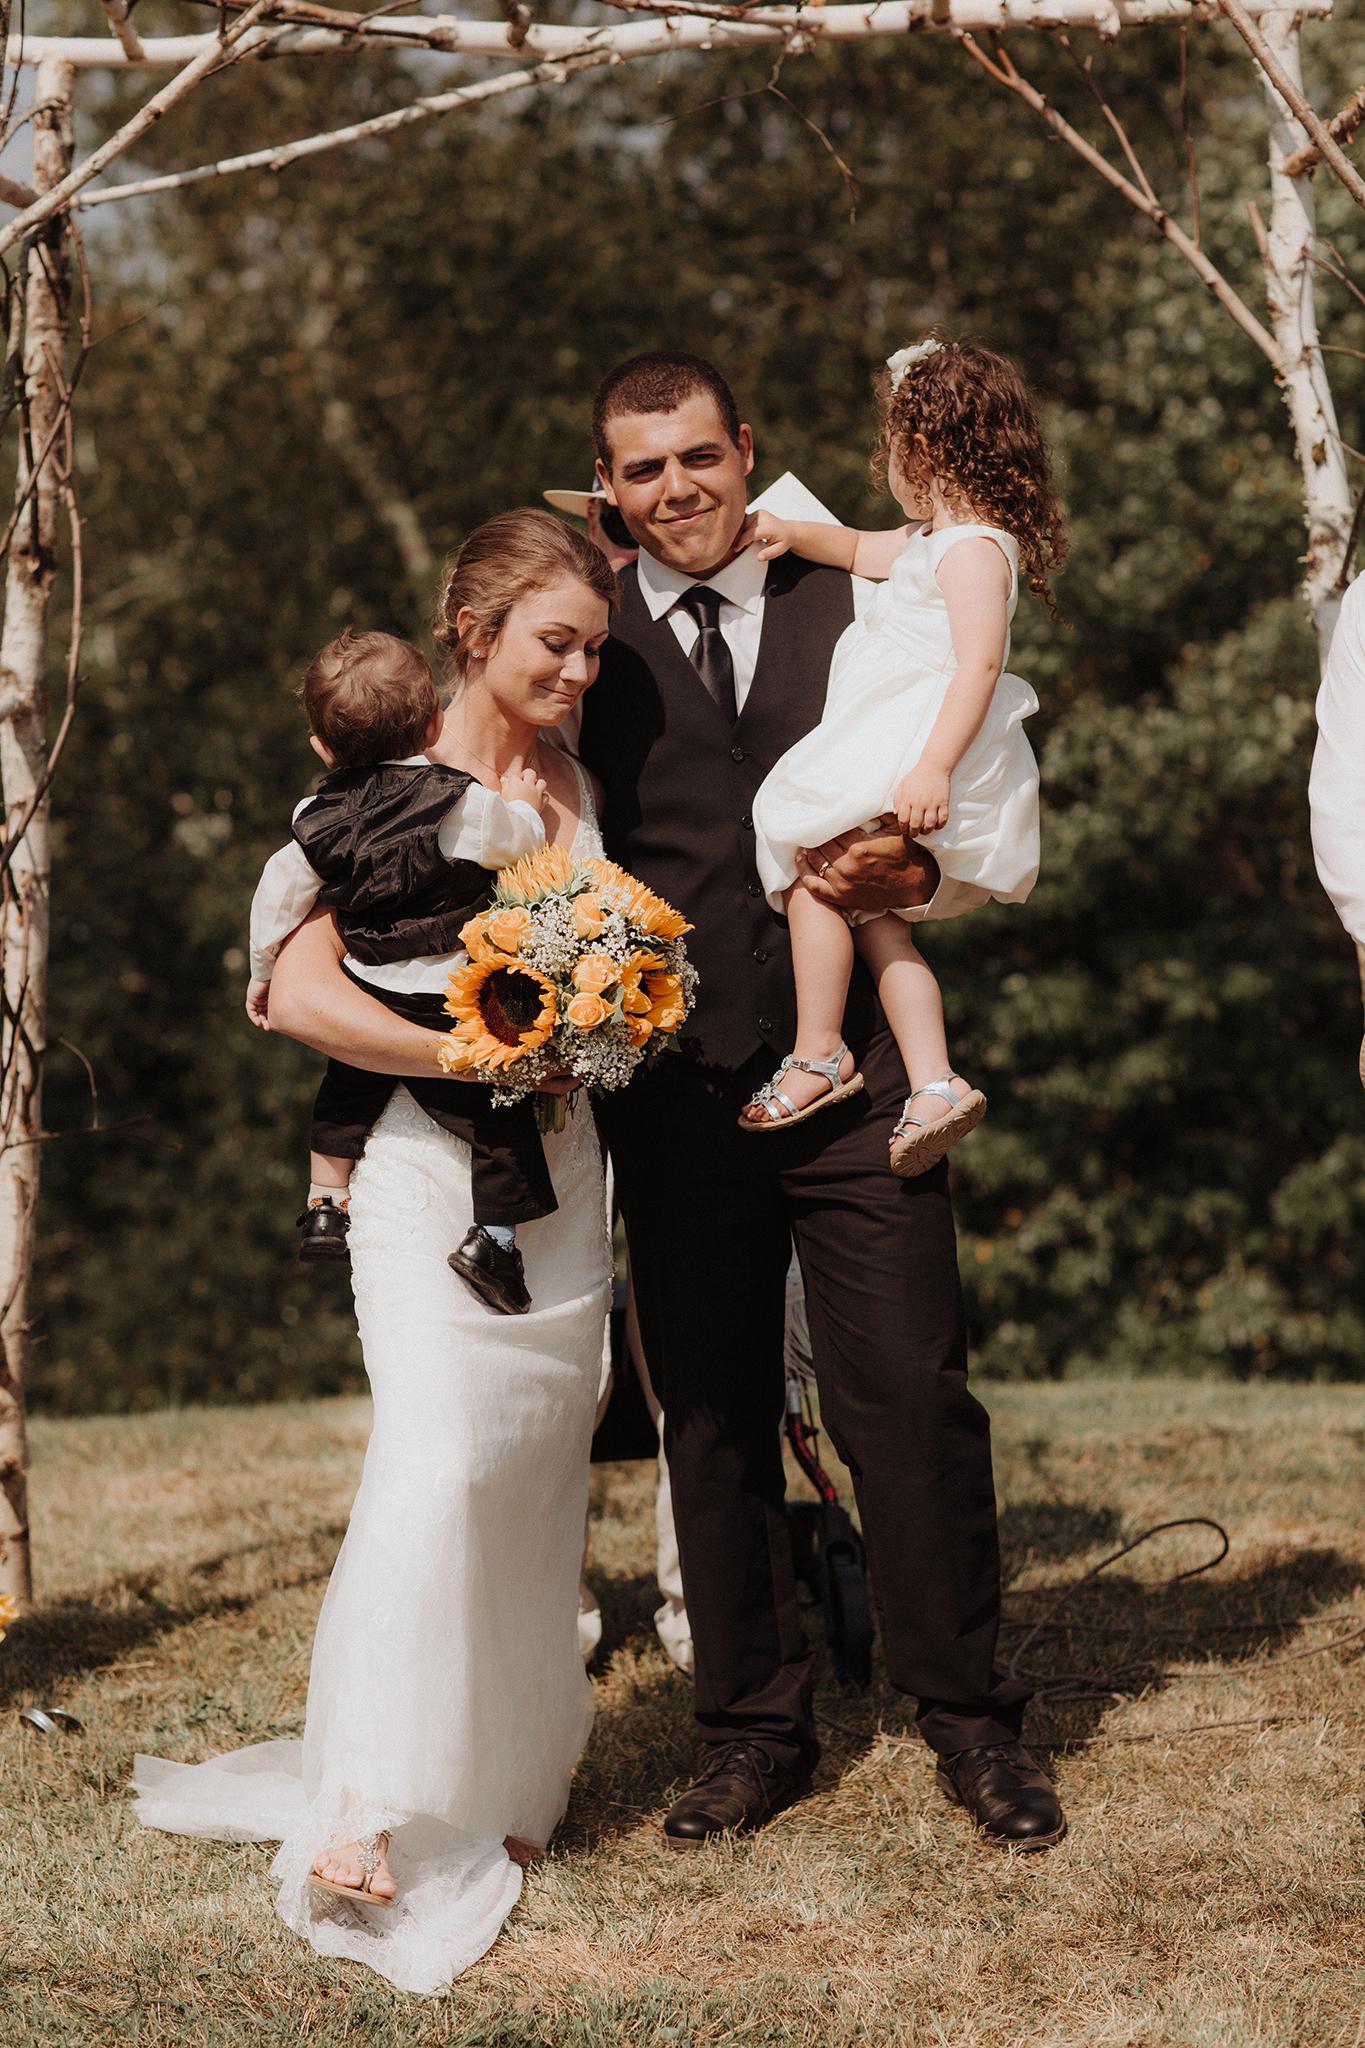 vermont-wedding-photographer-outdoor-farm-wedding-22.jpg